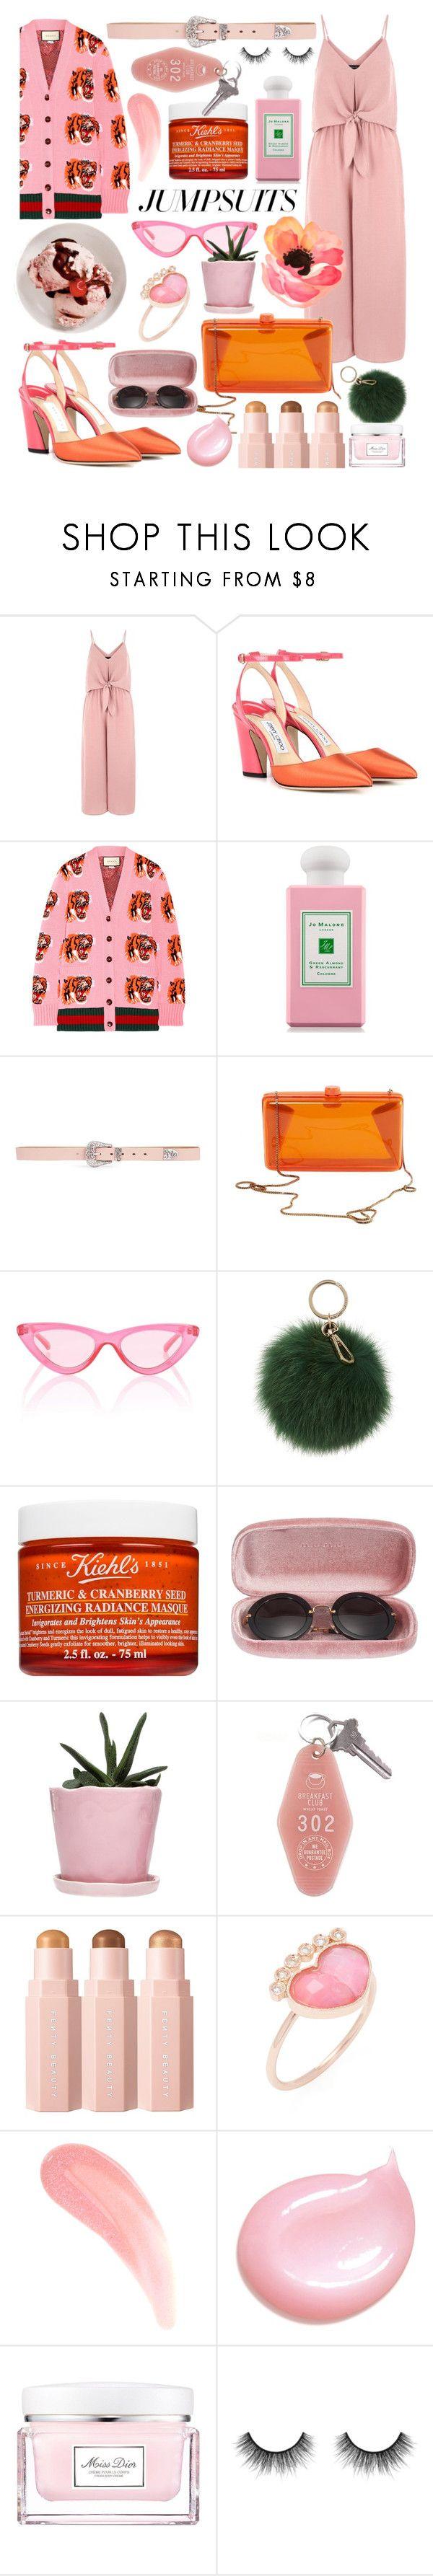 """Pink vs orange"" by cinnamon-keks ❤ liked on Polyvore featuring Jimmy Choo, Gucci, Jo Malone, Miss Selfridge, STELLA McCARTNEY, Le Specs, Coccinelle, Kiehl's, Miu Miu and Dot & Bo"